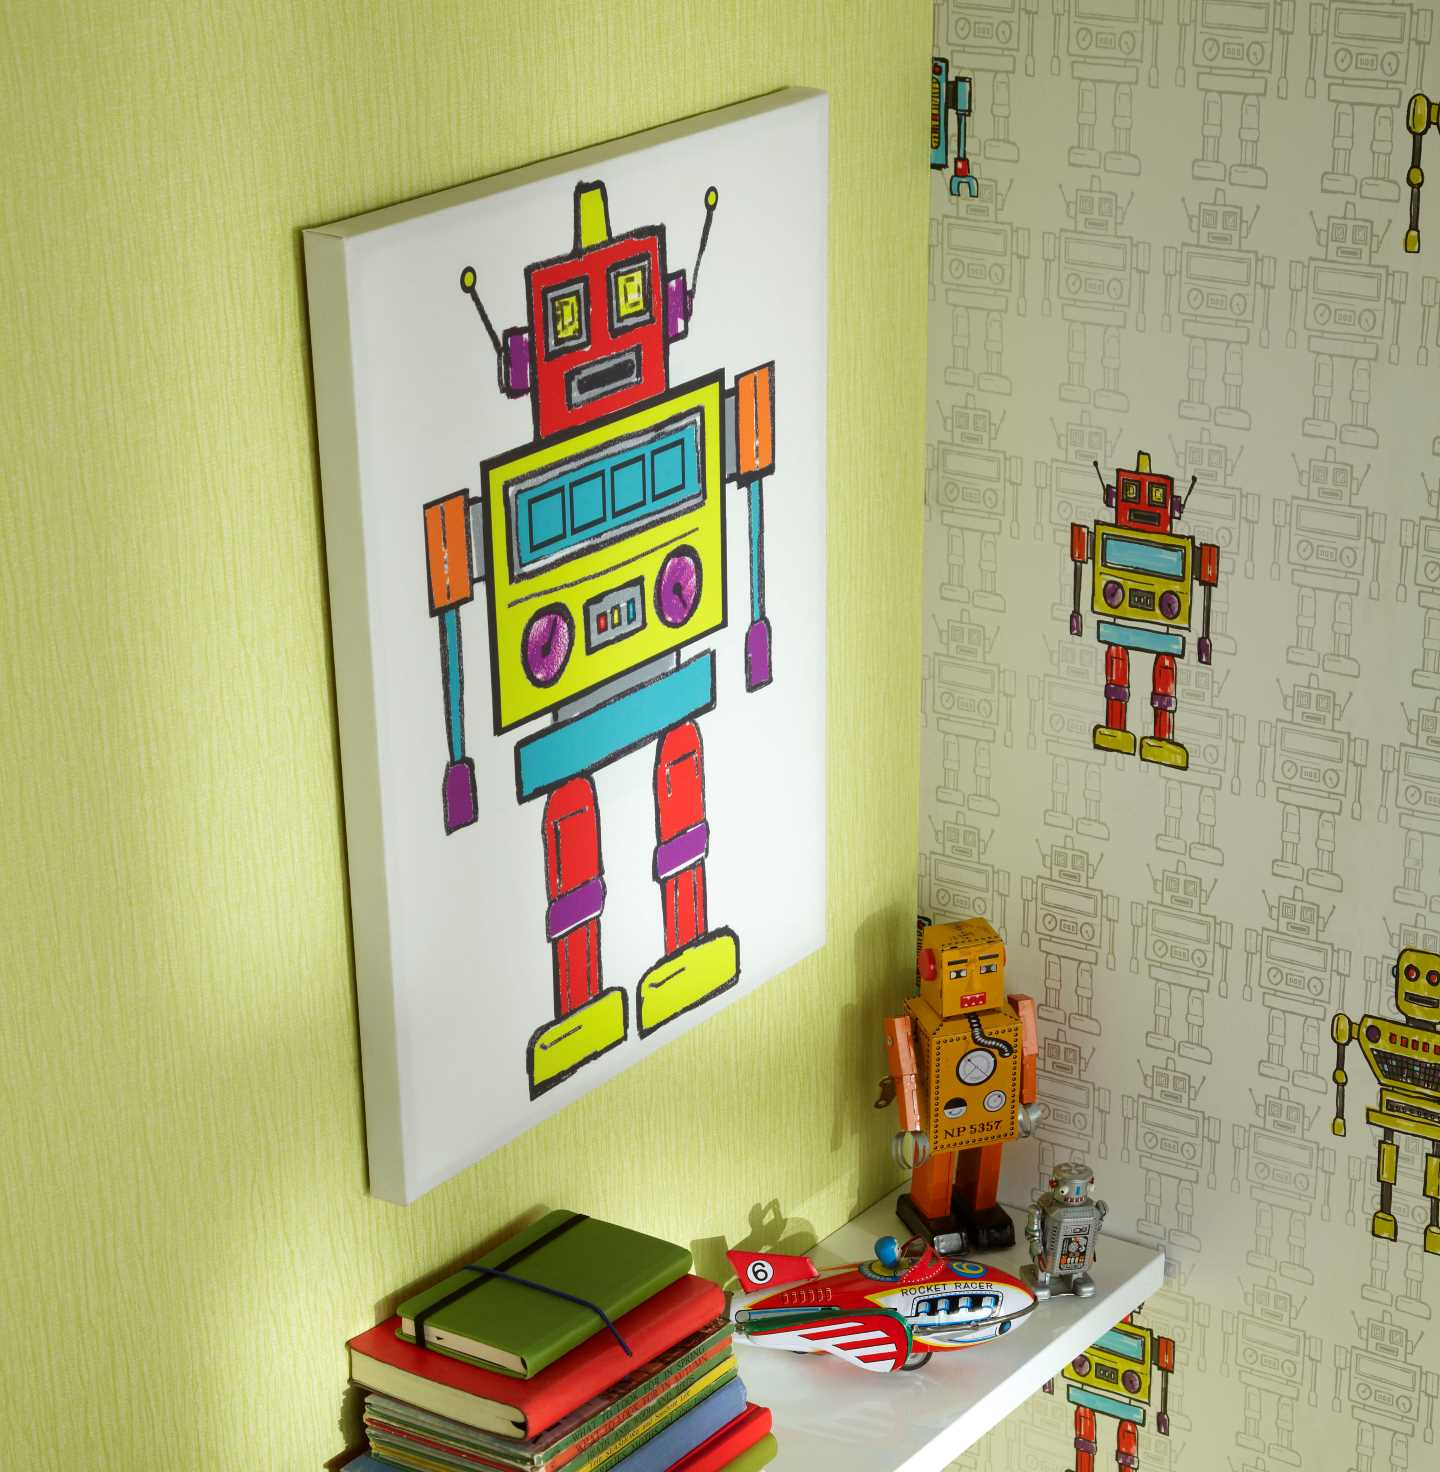 Lot 22 - 56 Arthouse Arthouse Robots LED Canvas